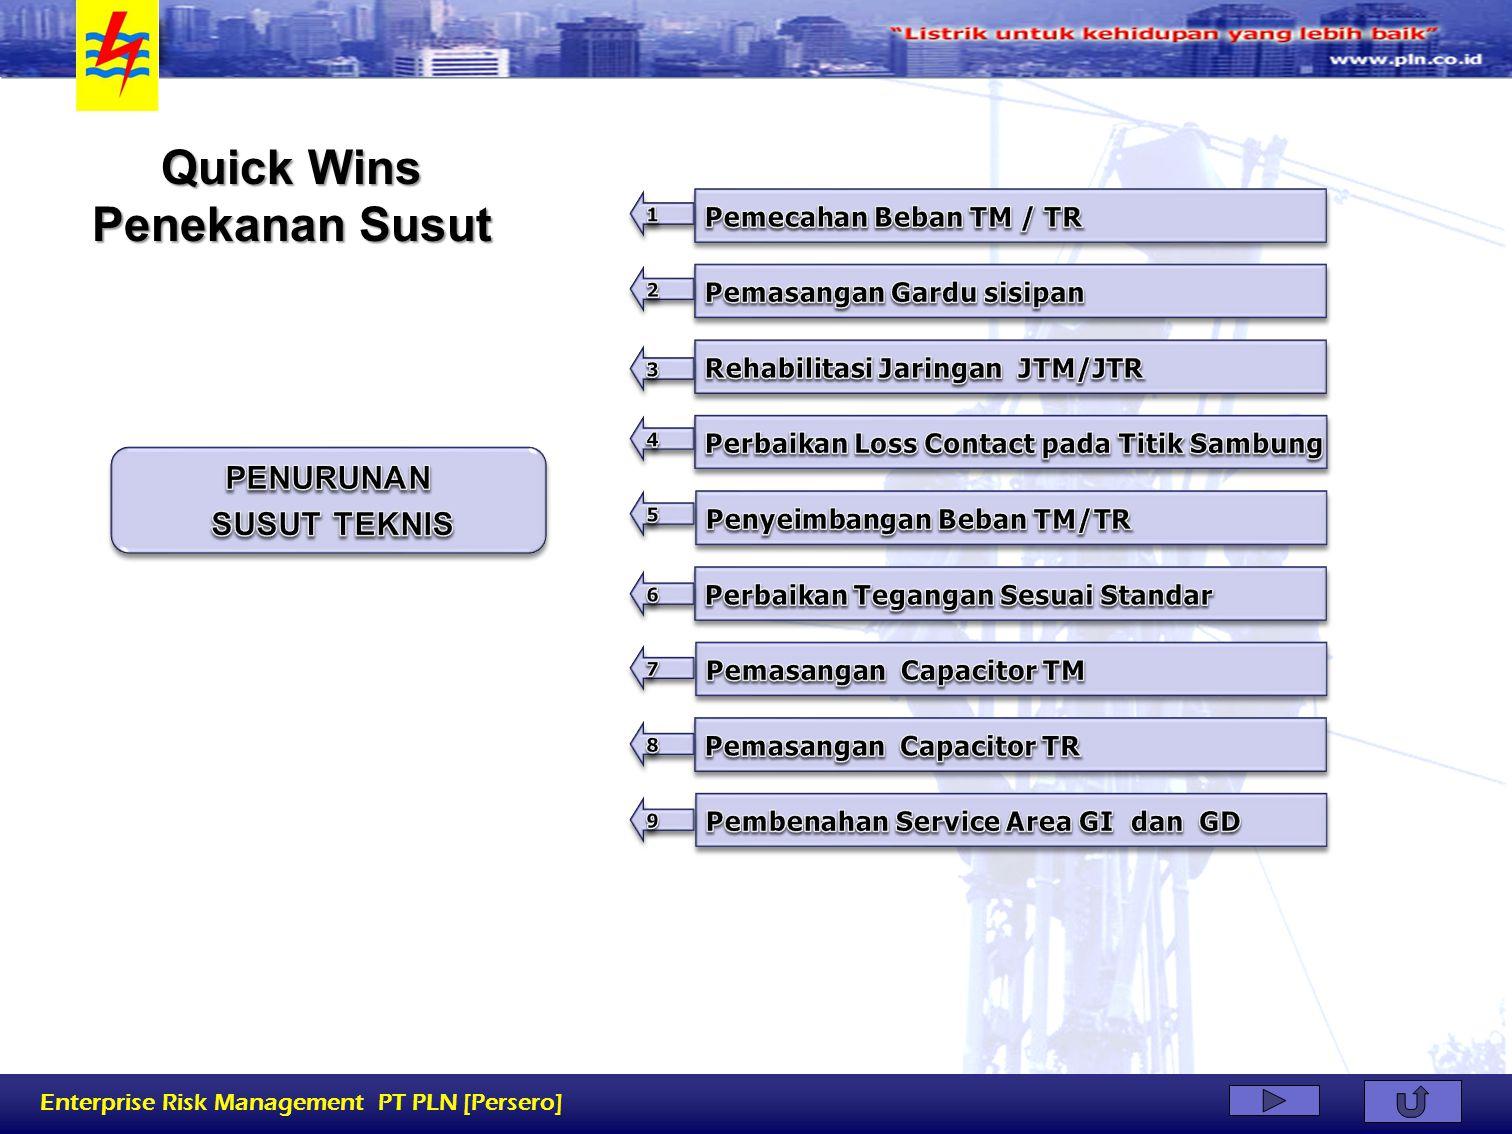 Enterprise Risk Management PT PLN [Persero] Quick Wins Penekanan Susut